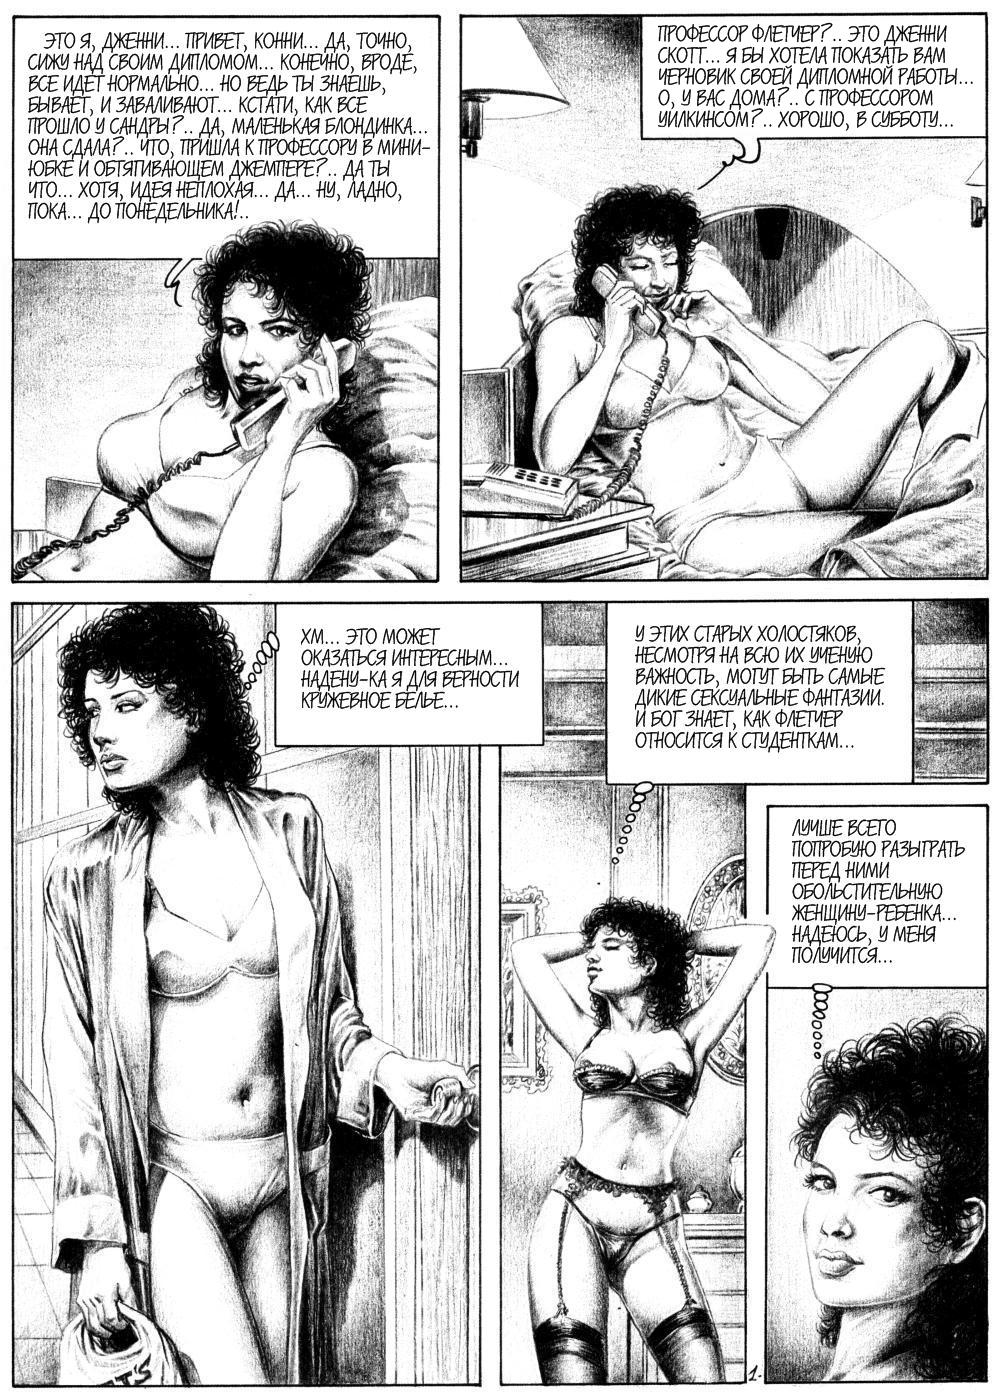 grey-masturbiruet-seks-s-professorom-za-otsenku